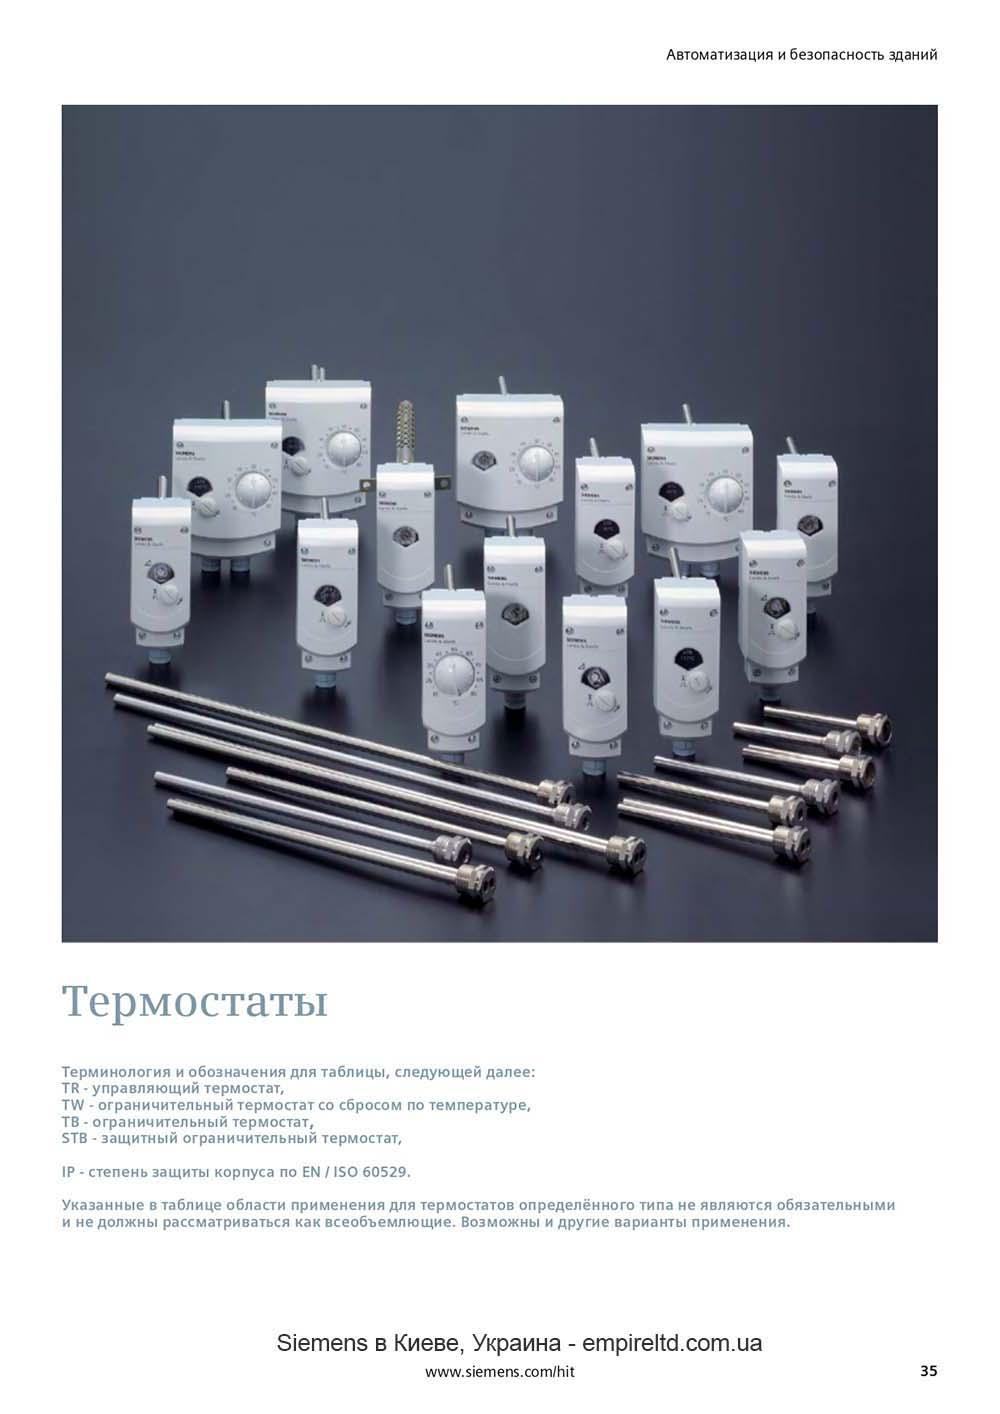 siemens-kiev-ukraine-0019-1